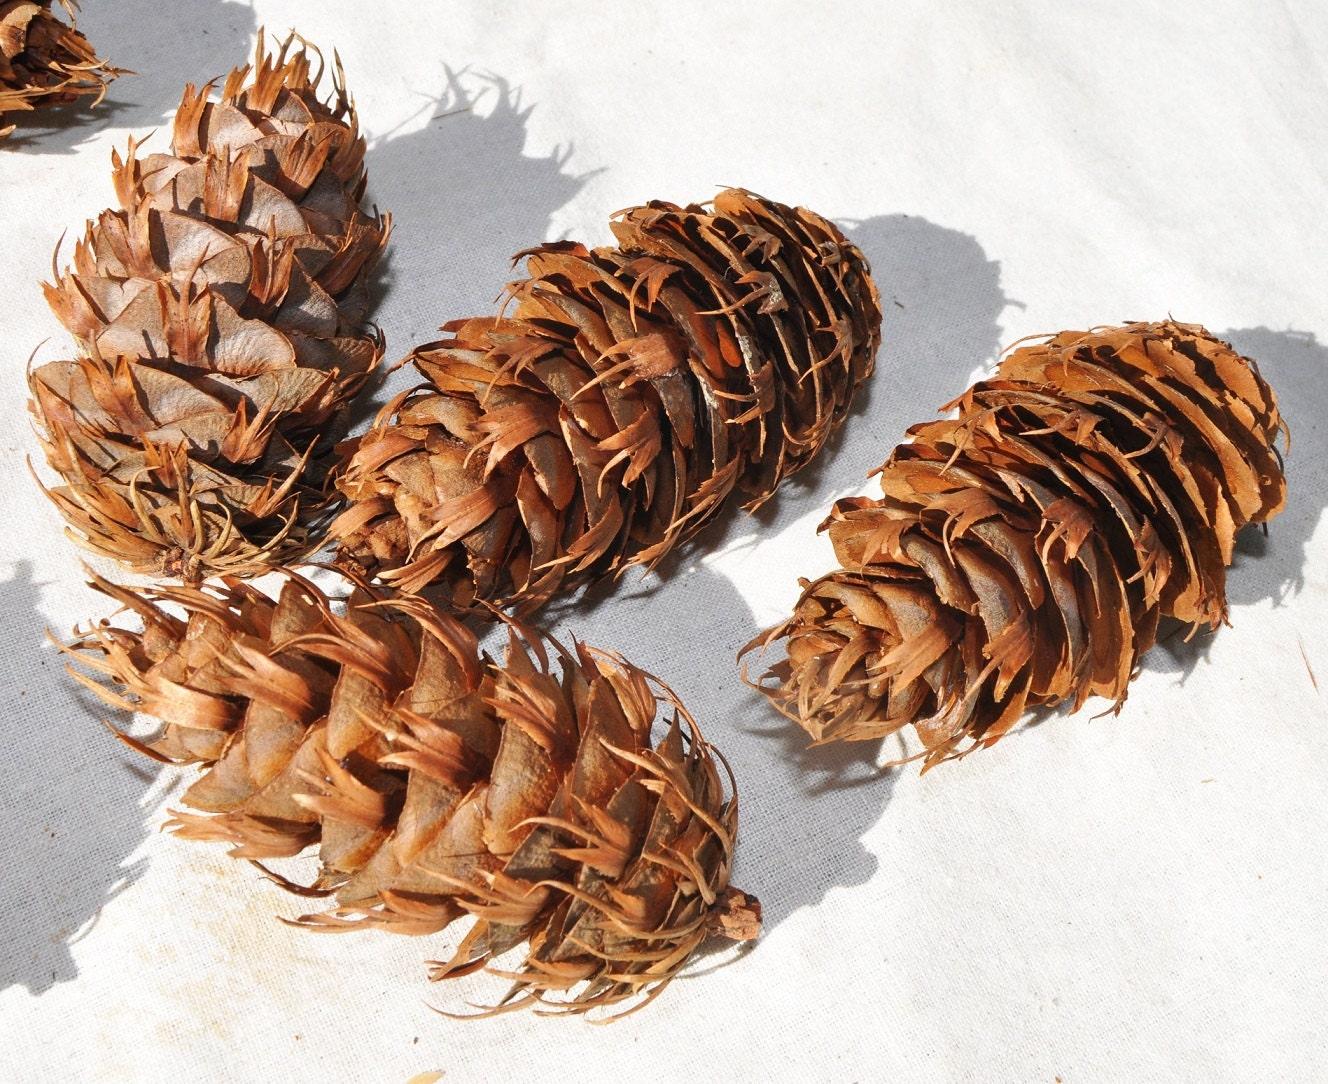 20 Fir Cones, Douglass Fir Cones, Pine Cones, Pinecone, Pinecones ...